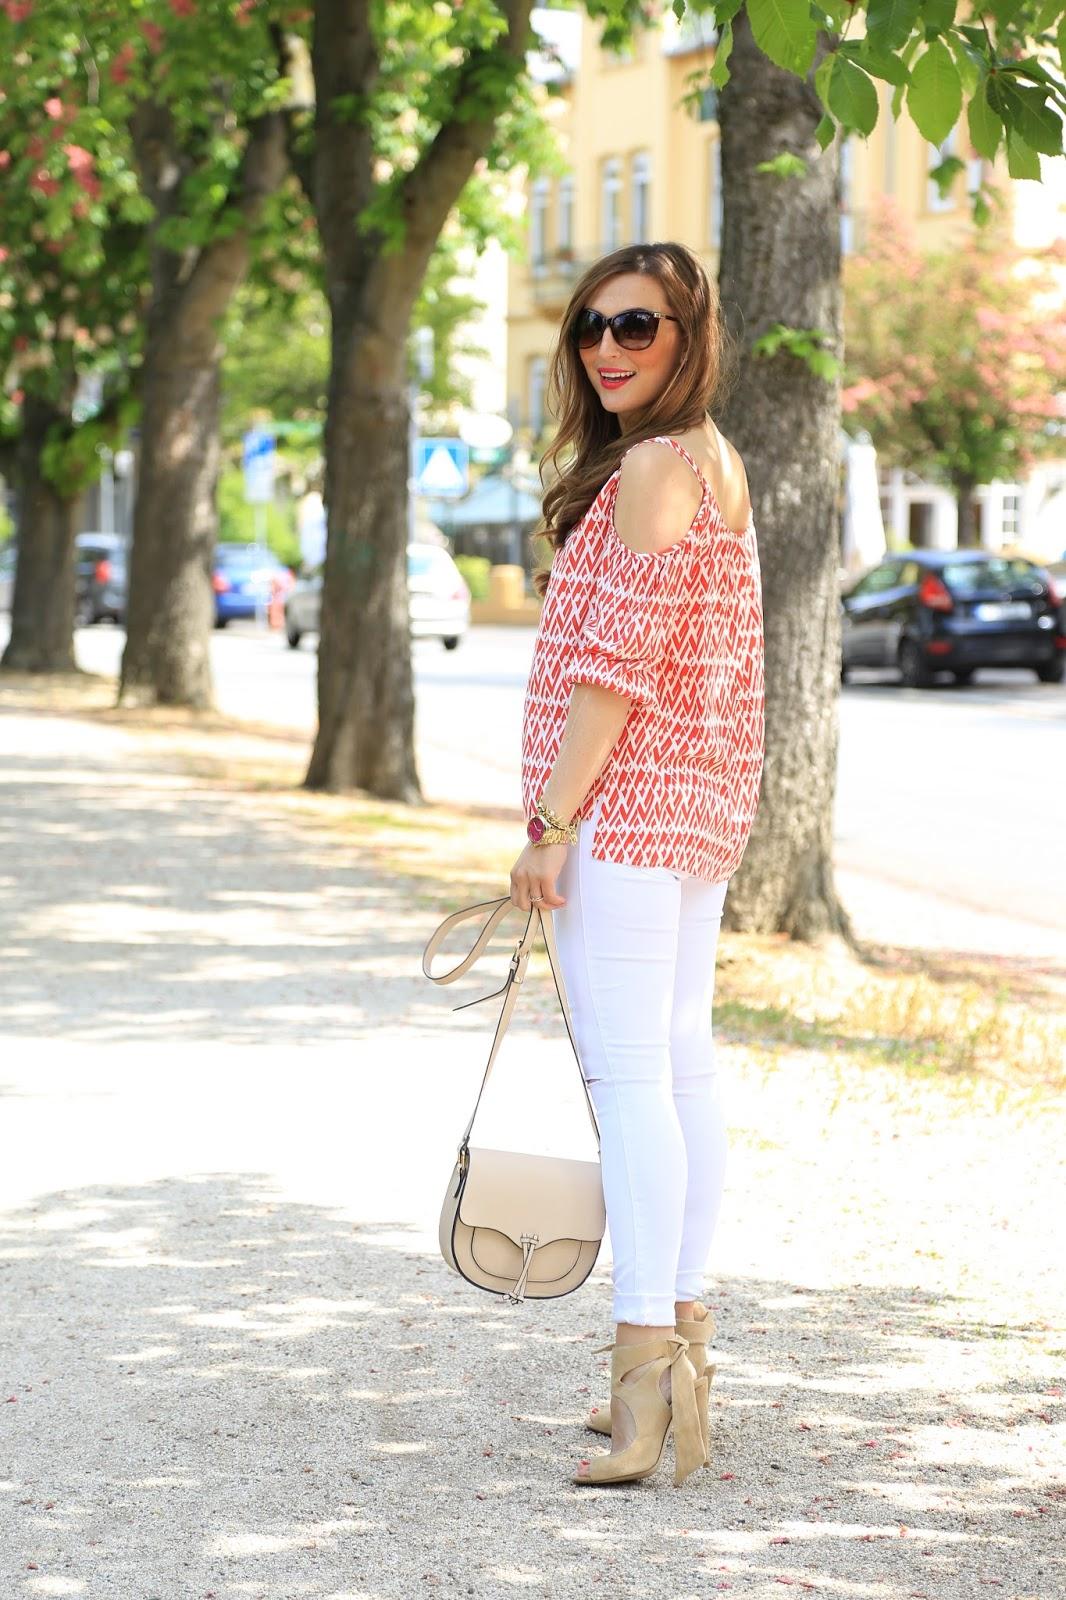 Fashionblogger aus Deutschland - German Fashionblogger - Olivia Palermo Look - Olivia Palermo Style